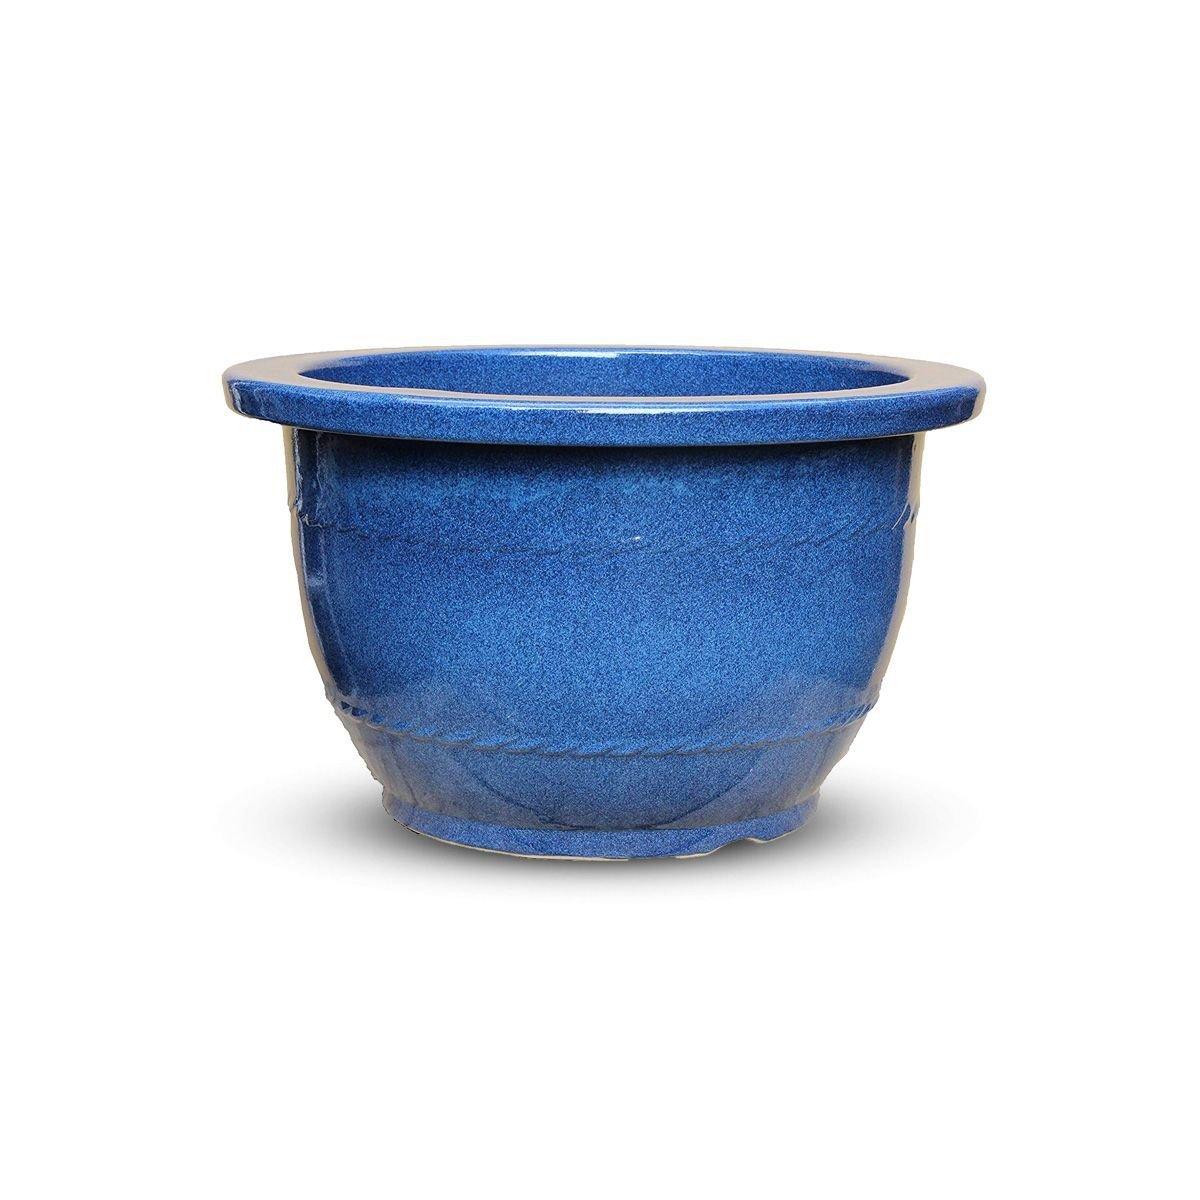 CtoC JAPAN Select 信楽焼 植木鉢 生子リンガタ 18号 18号生子リンガタ鉢 おしゃれ 陶器 4941273317067 B07FK6H2VY  18号